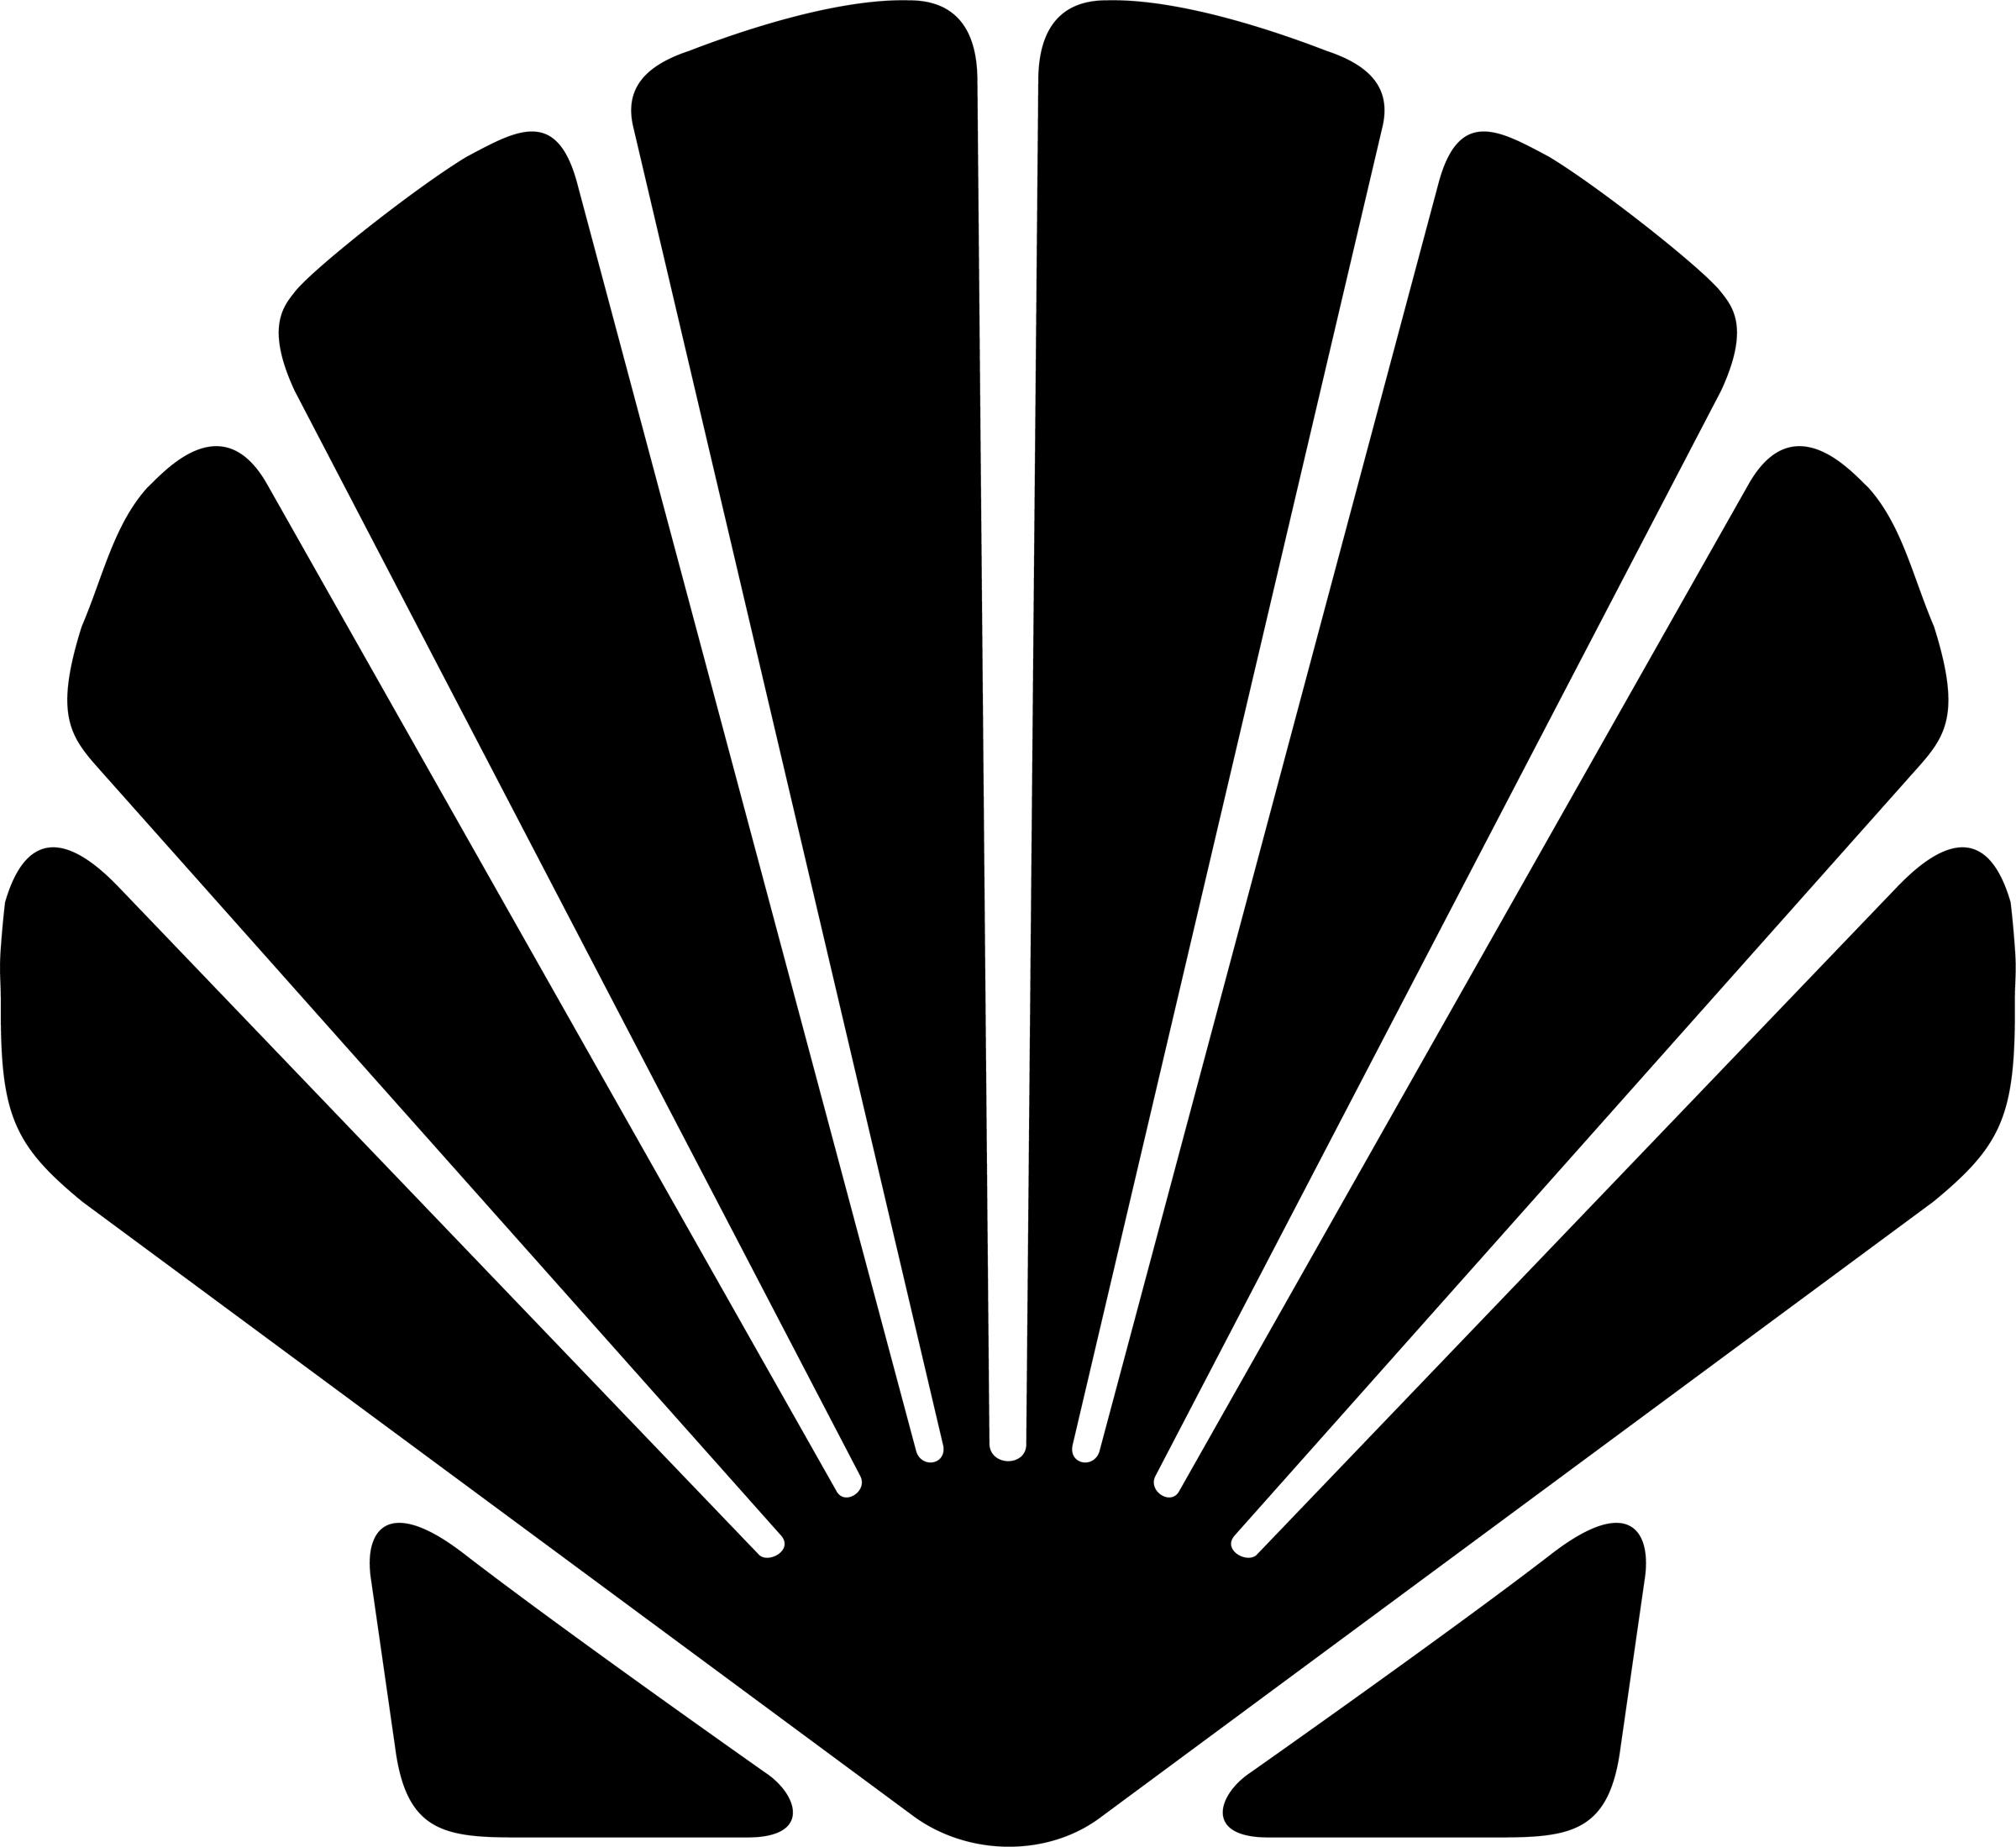 Shells clip art seashell cartoon clipart seashell cartoon.